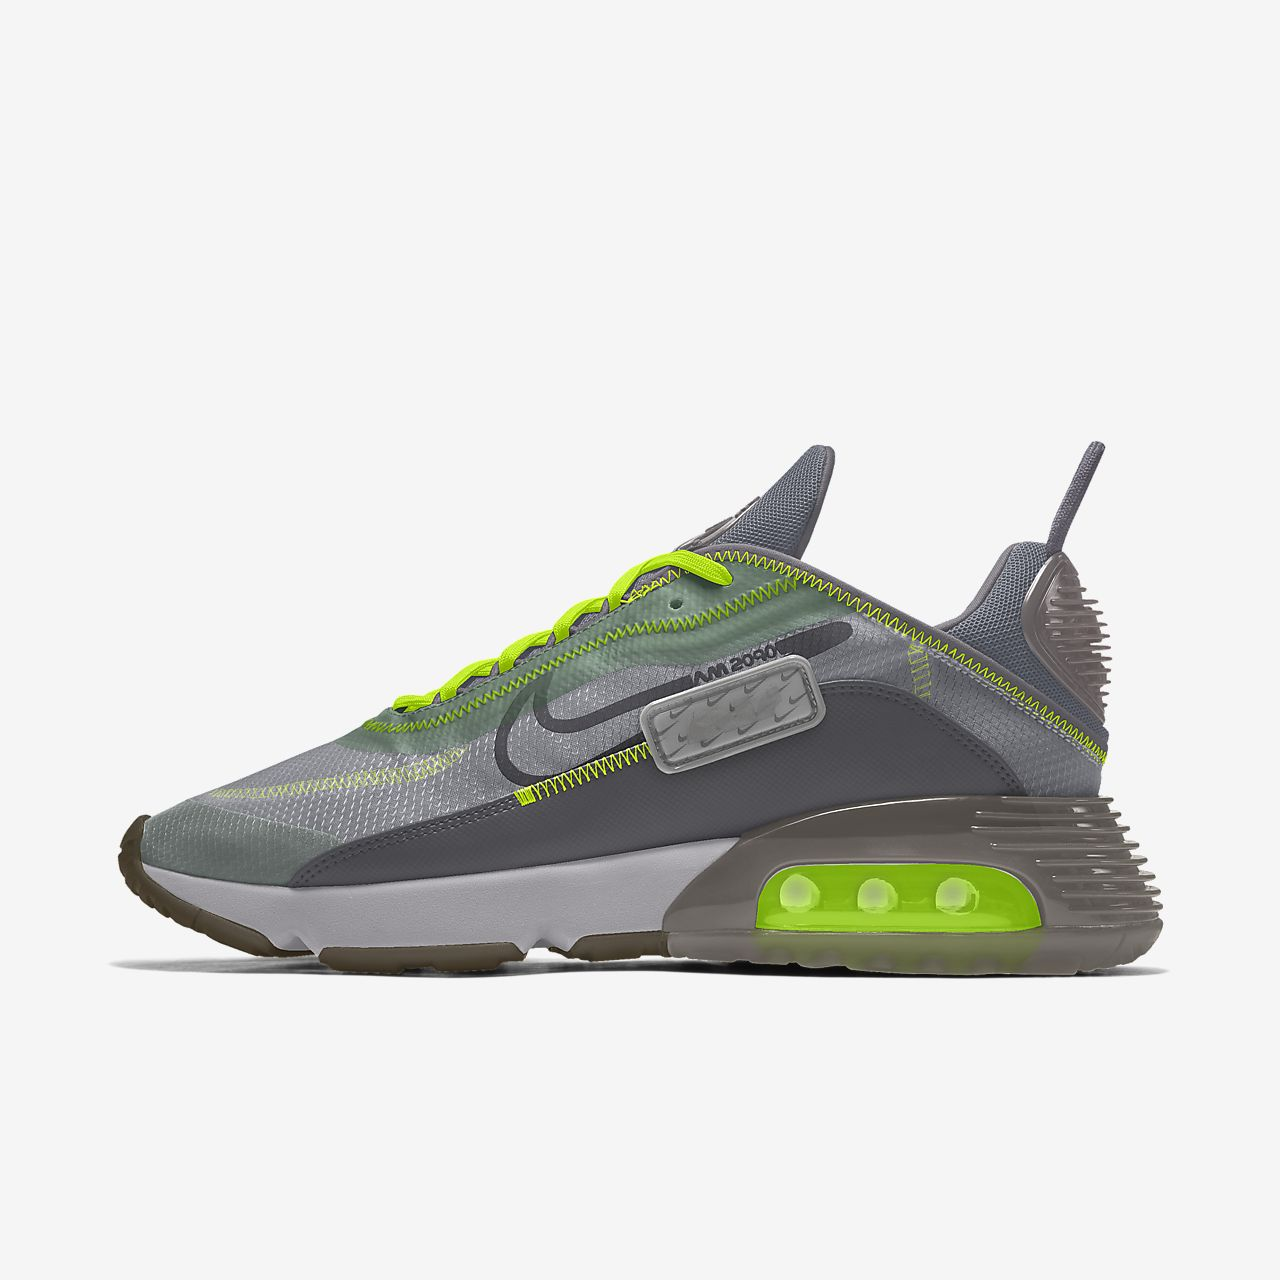 Nike Air Max 2090 By You 专属定制男子运动鞋